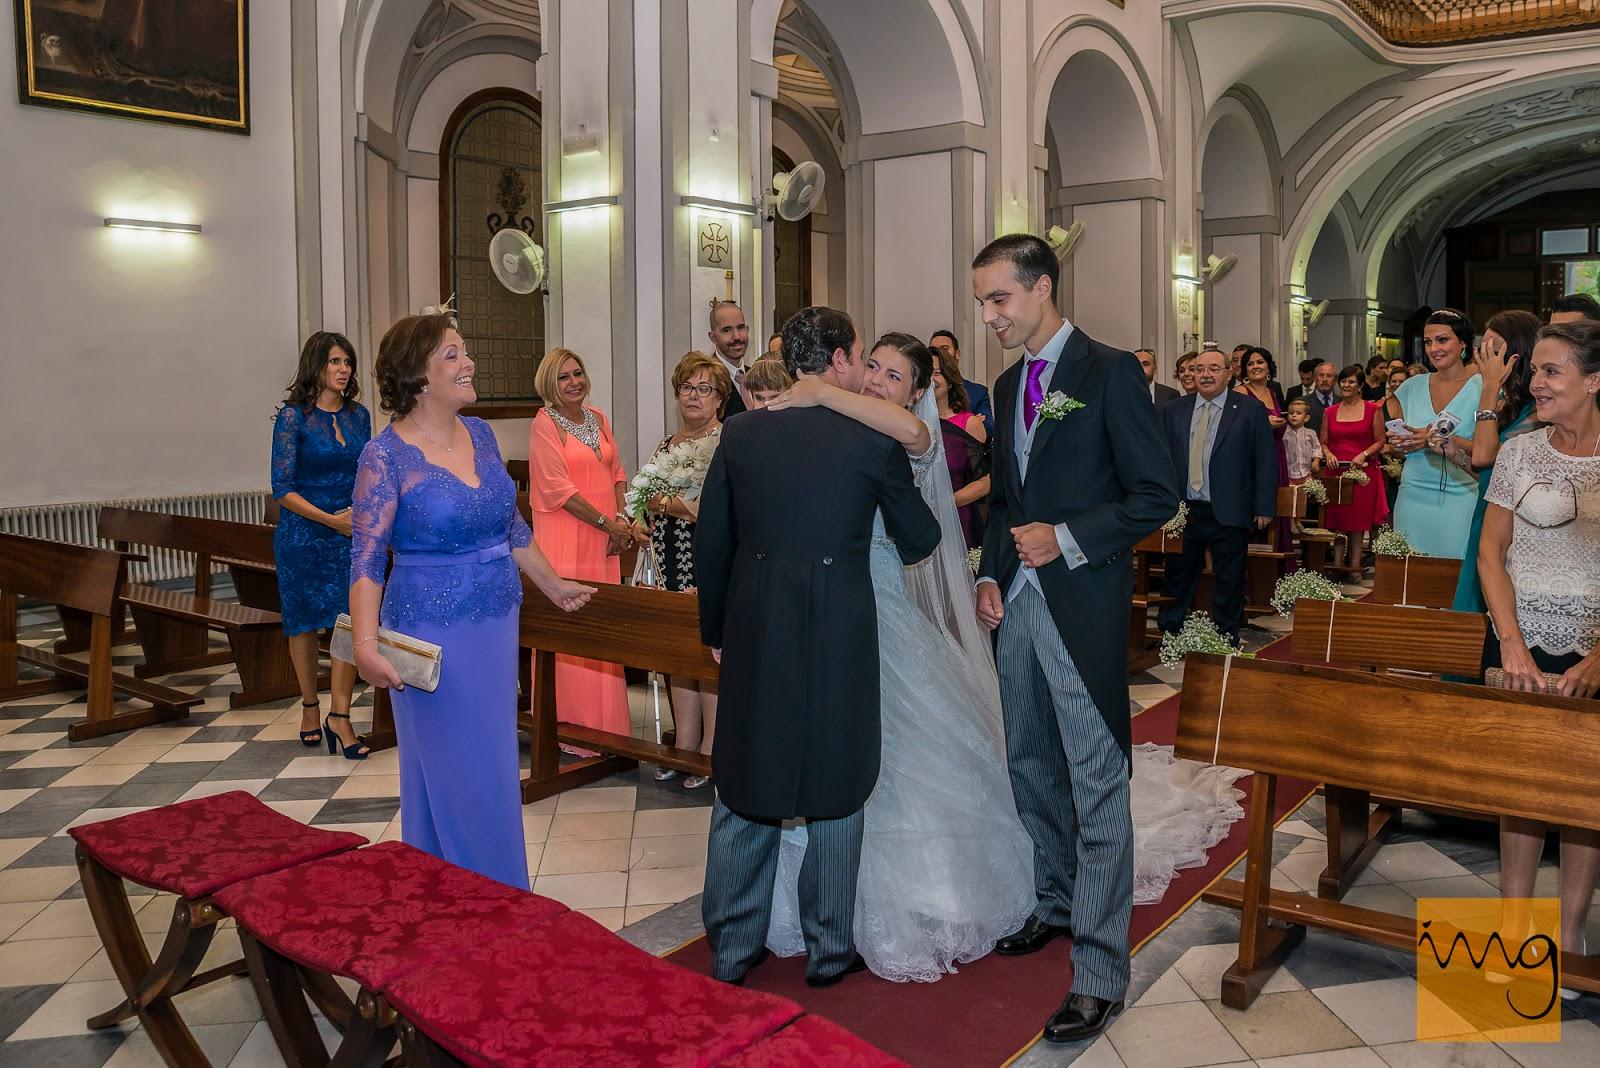 Fotografía de boda, primer abrazo